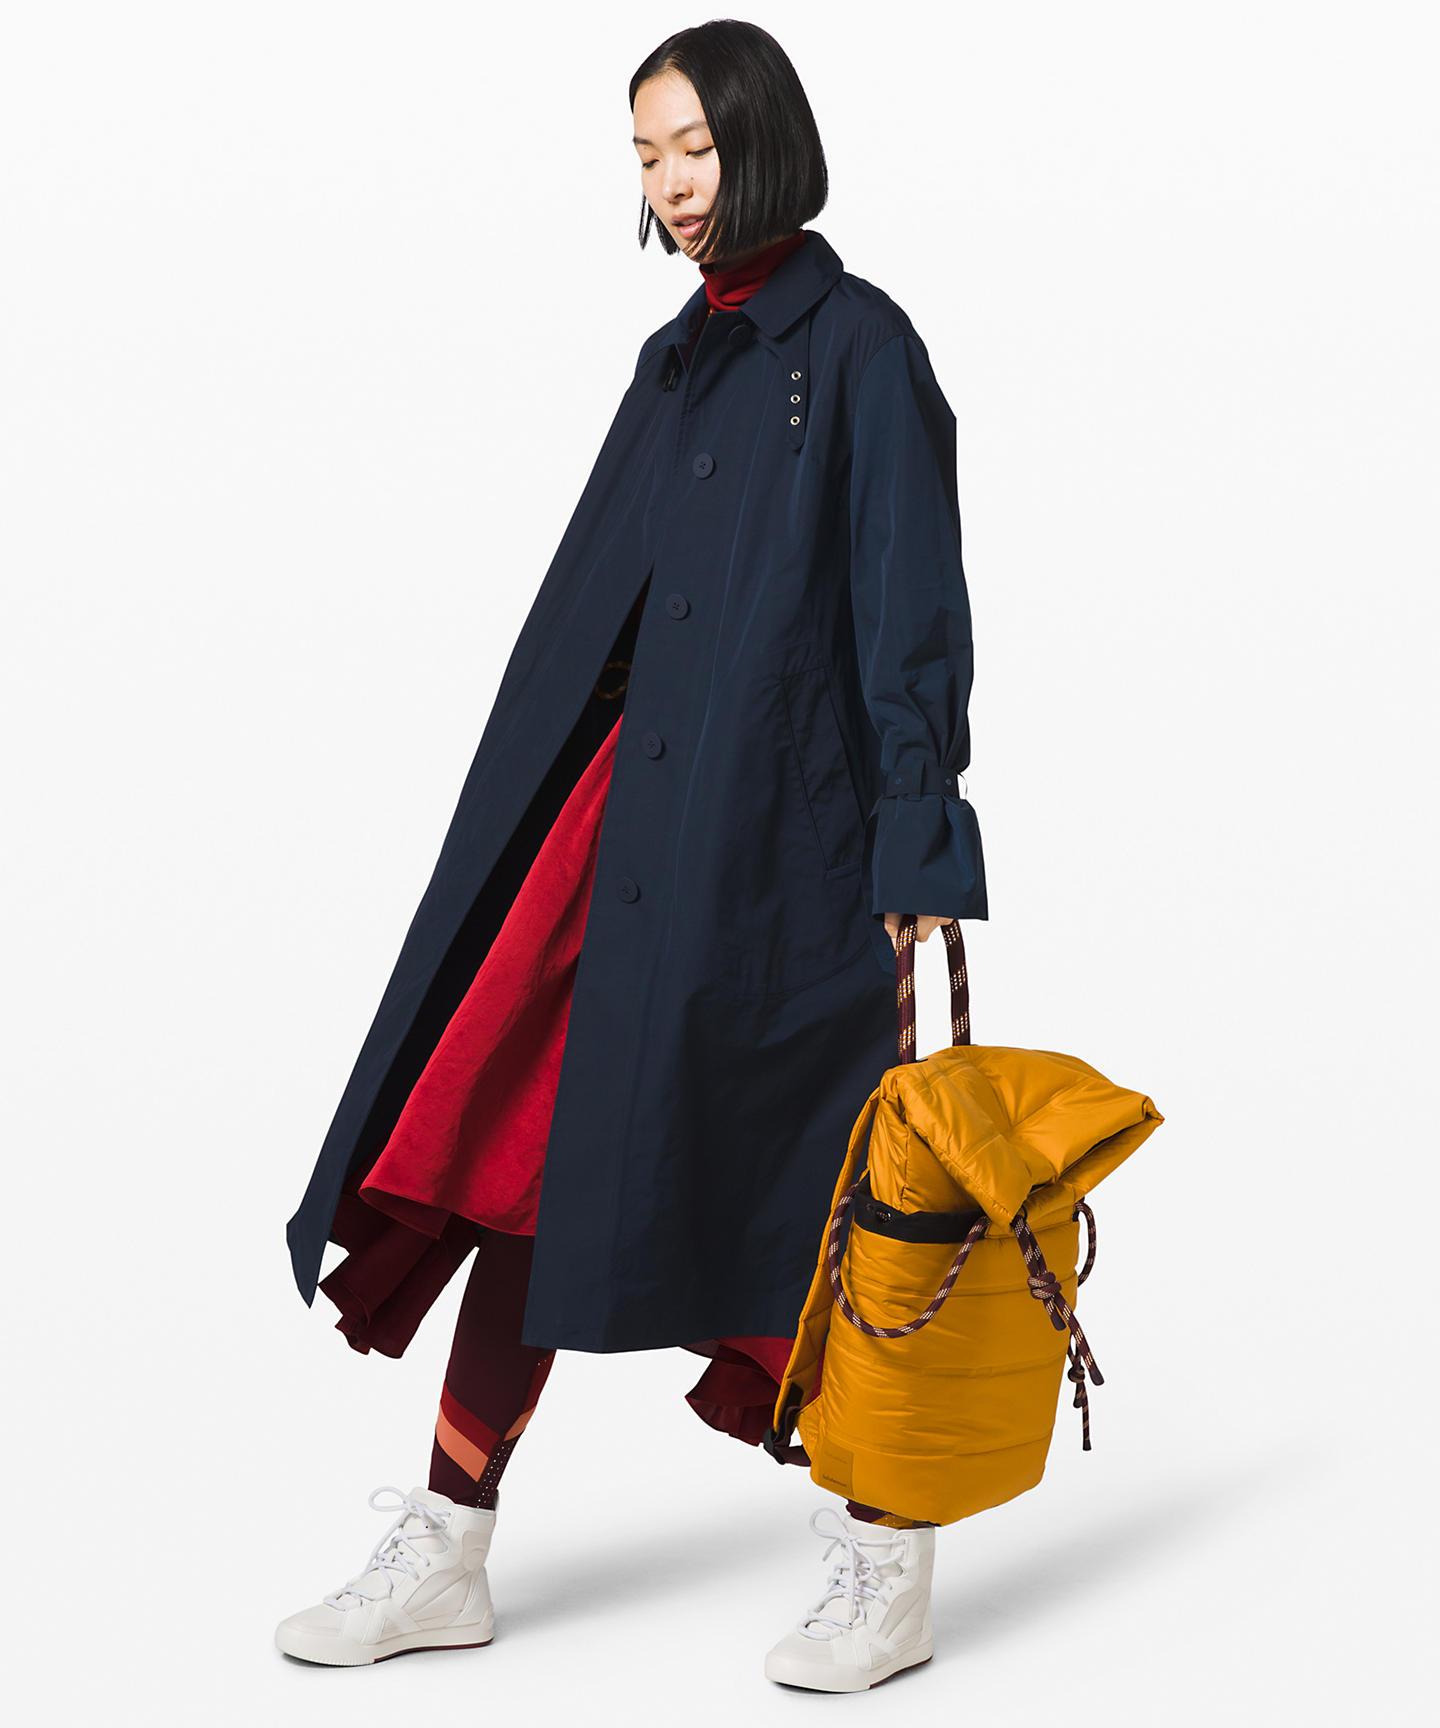 Lululemon x Roksanda Part 2 trench coat